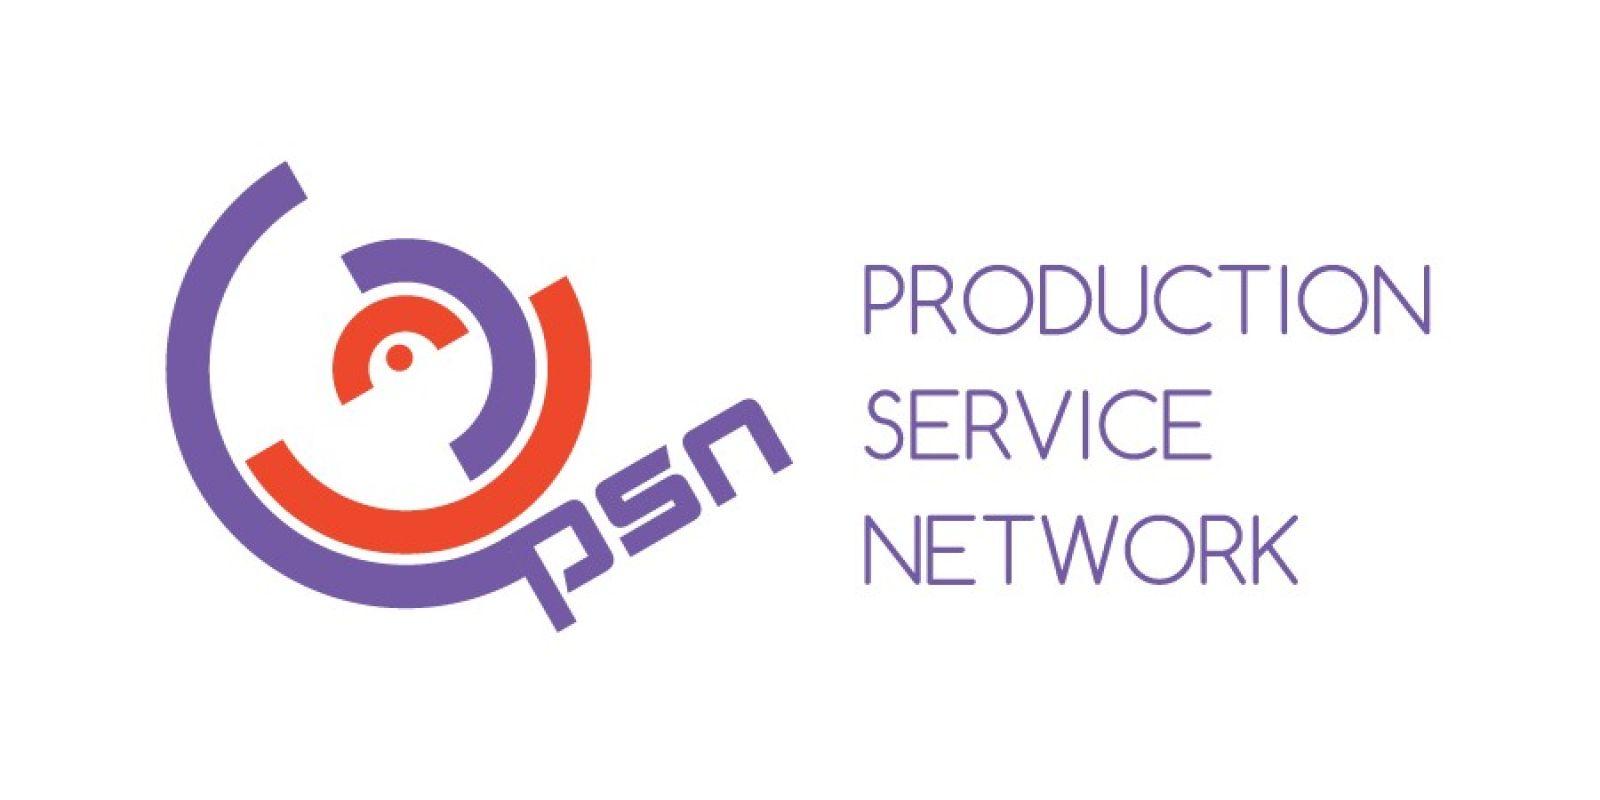 Production Service Network Logo